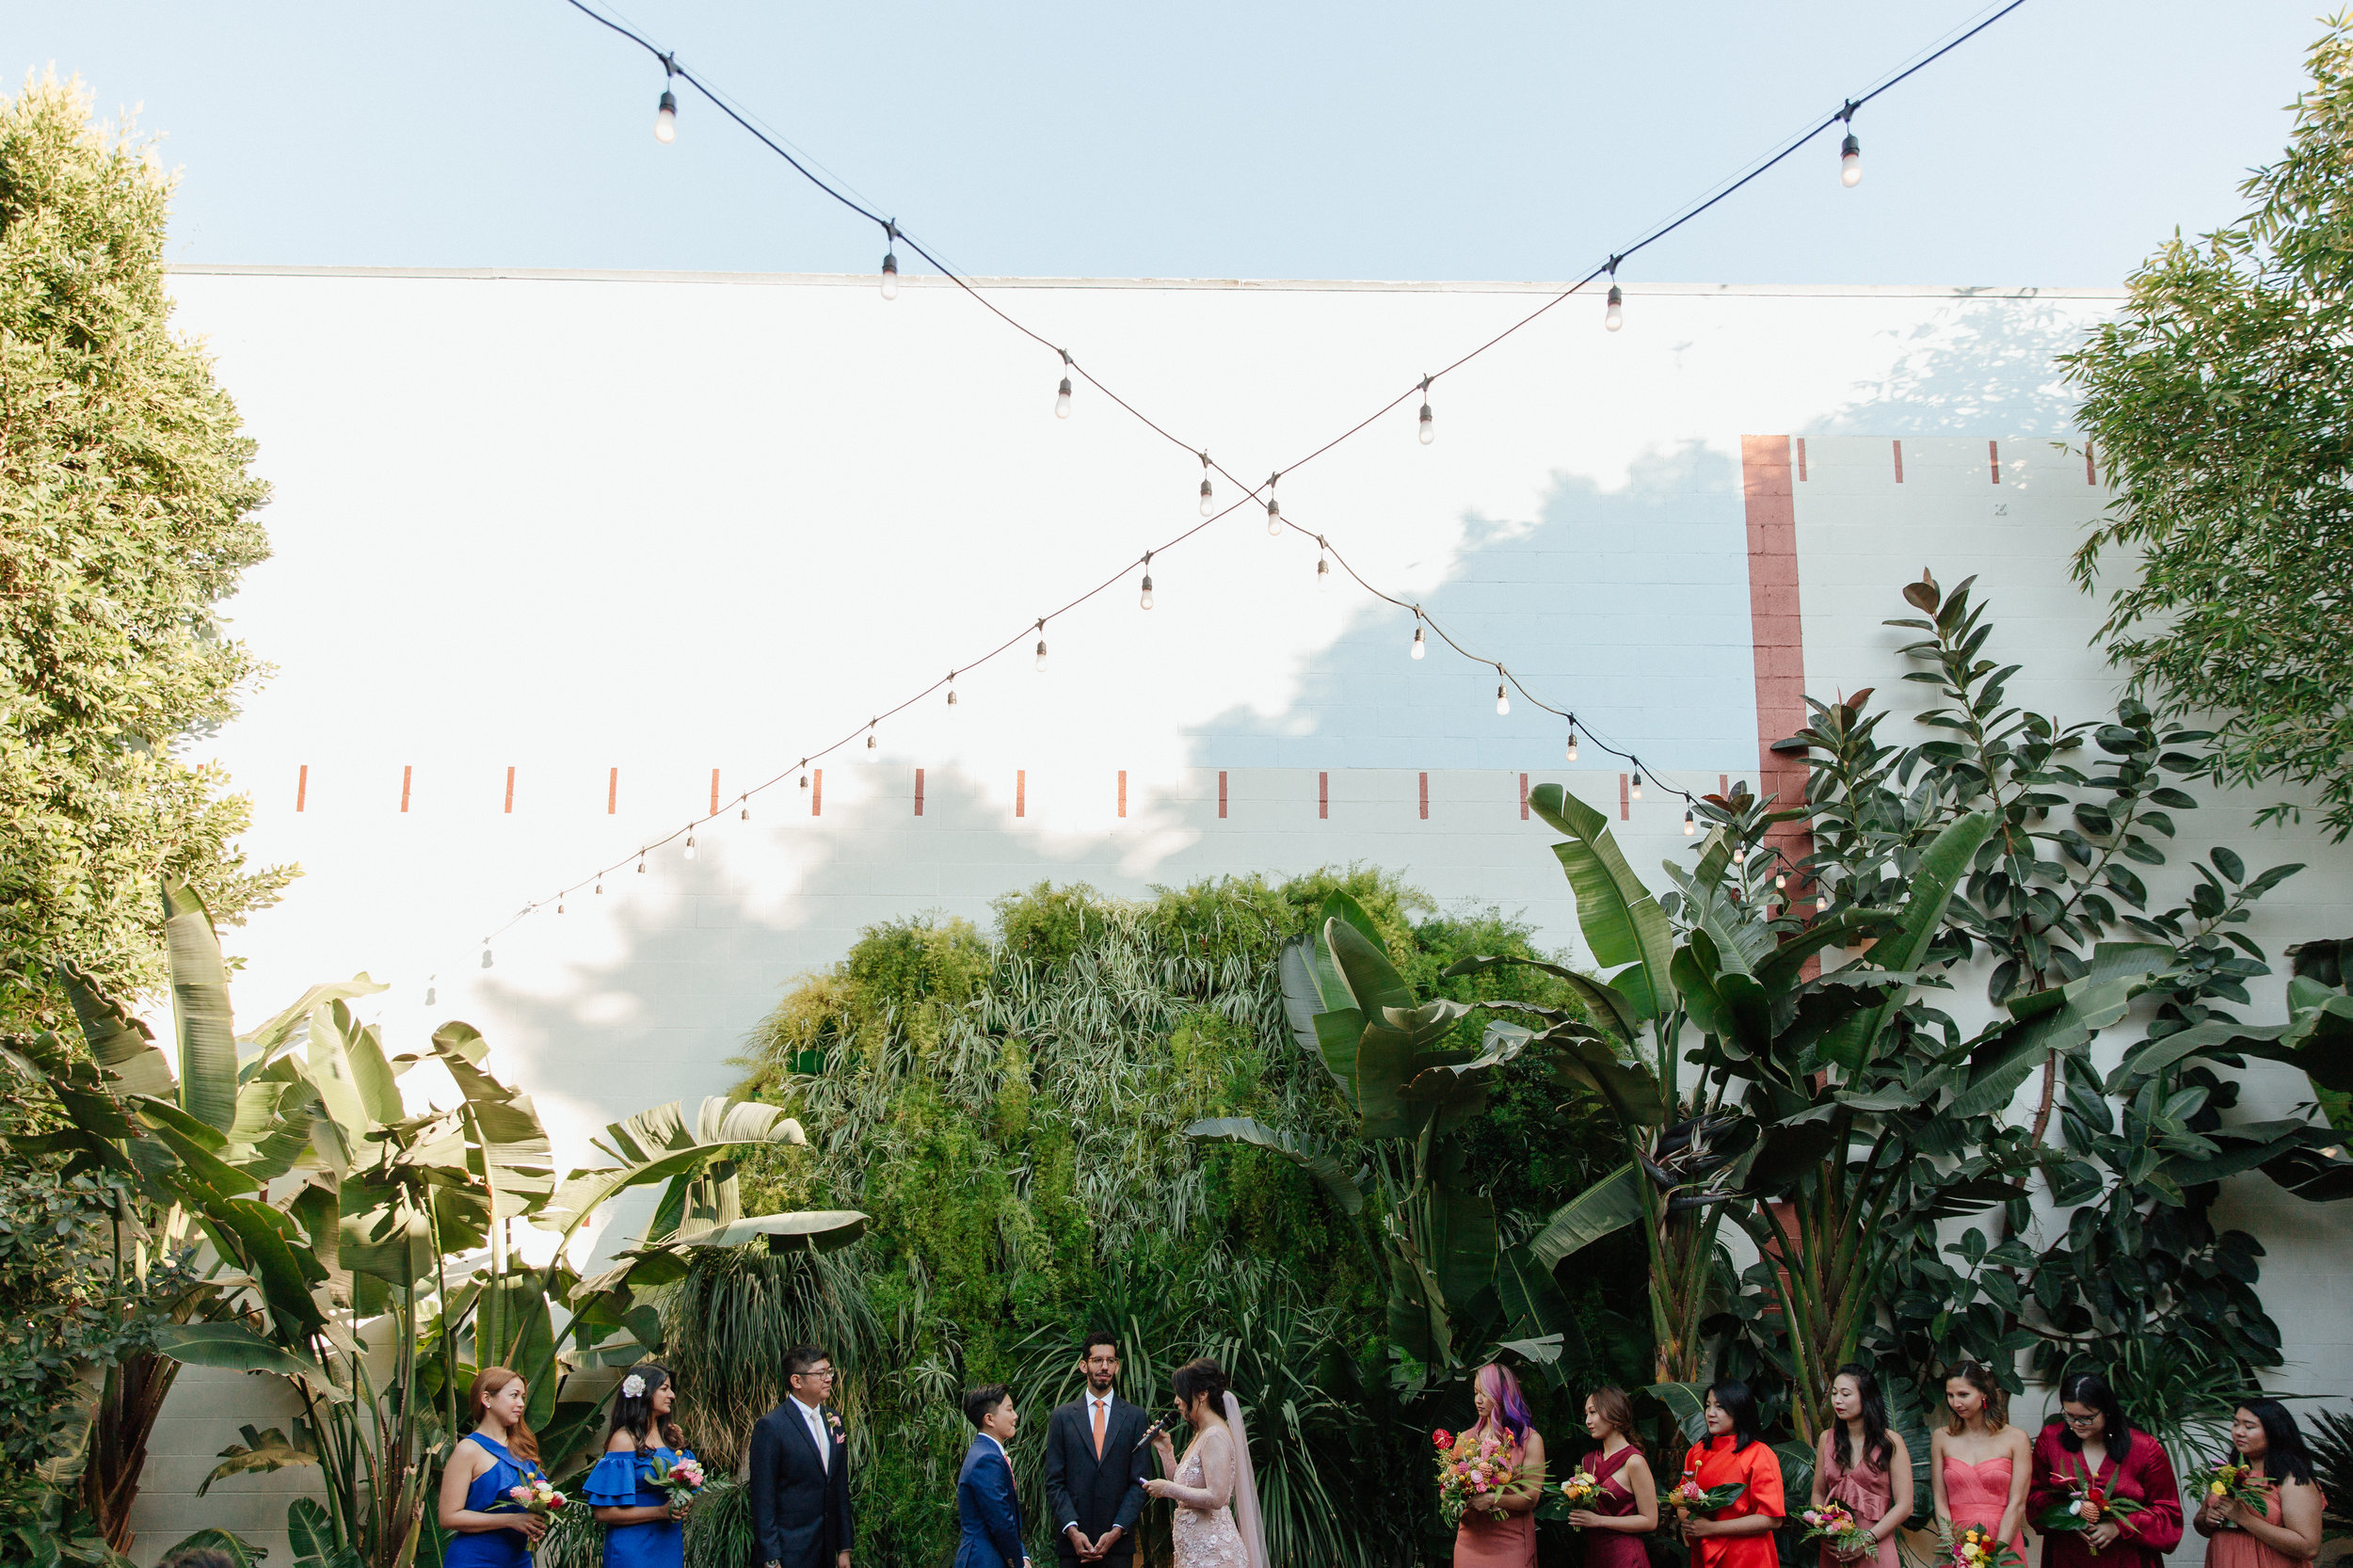 millwick-wedding-marble-rye-photography-030118-ceremony-087.jpg